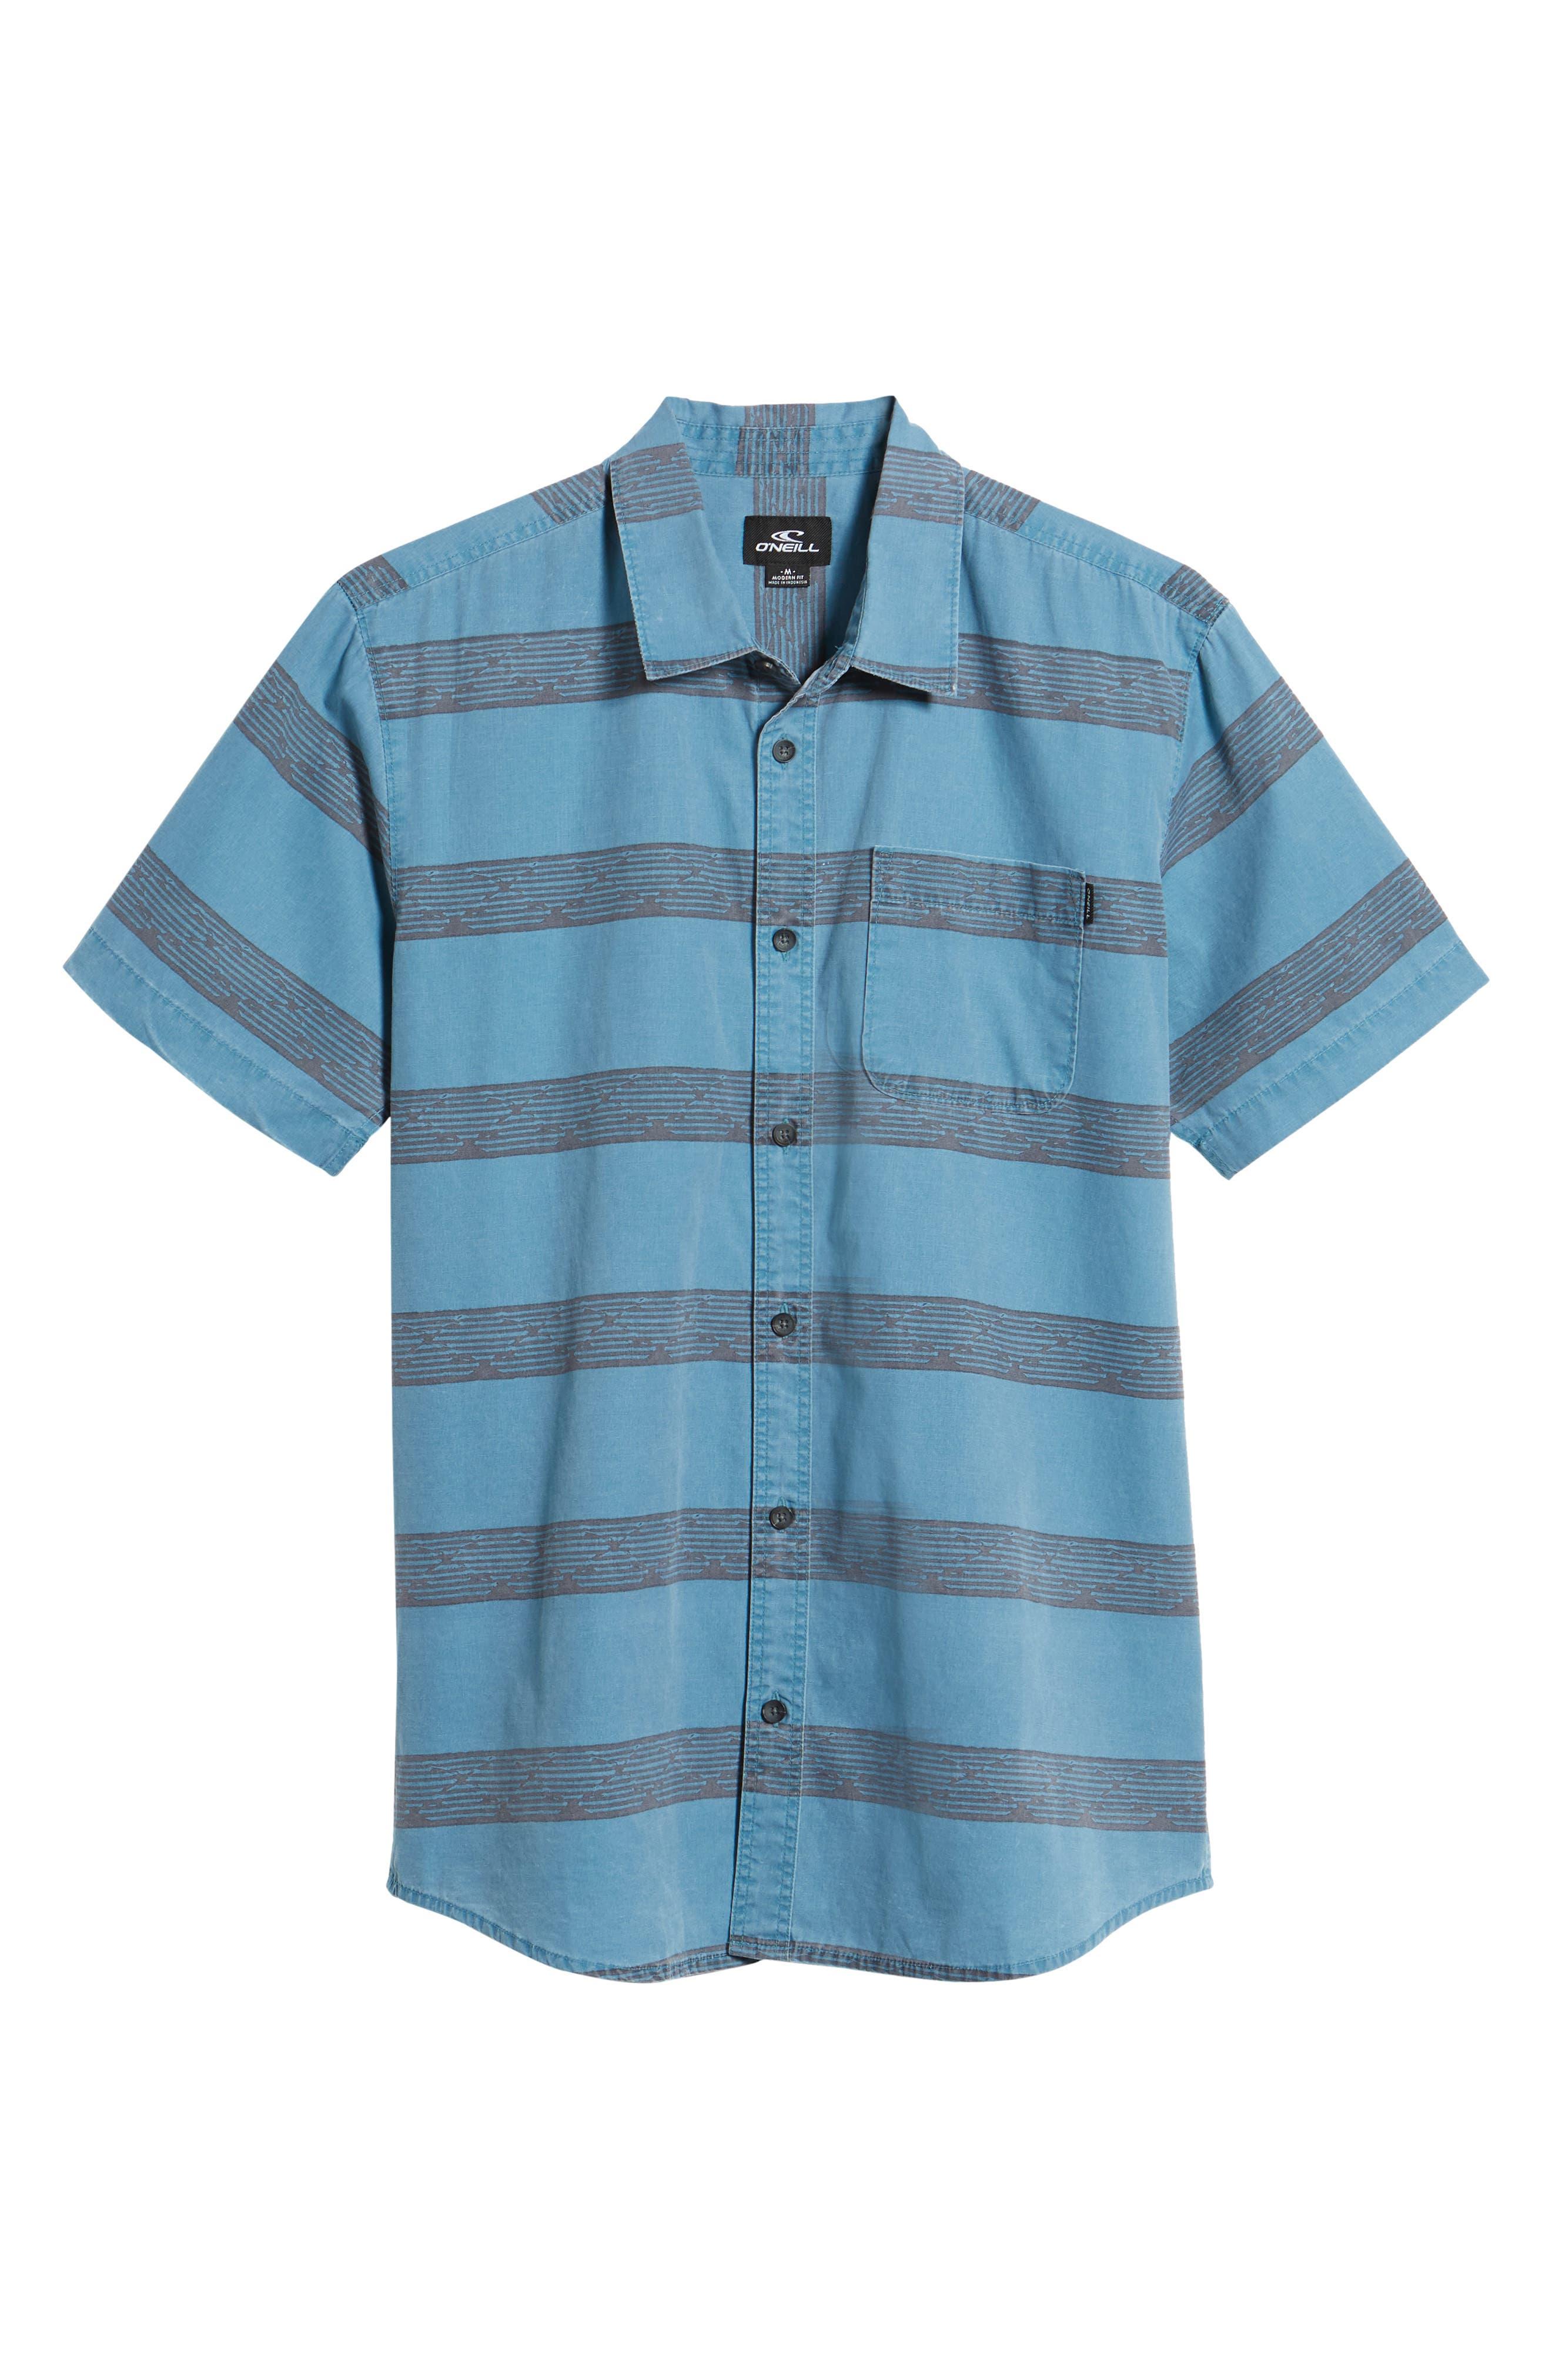 Wagner Woven Shirt,                             Alternate thumbnail 6, color,                             DEEP TEAL